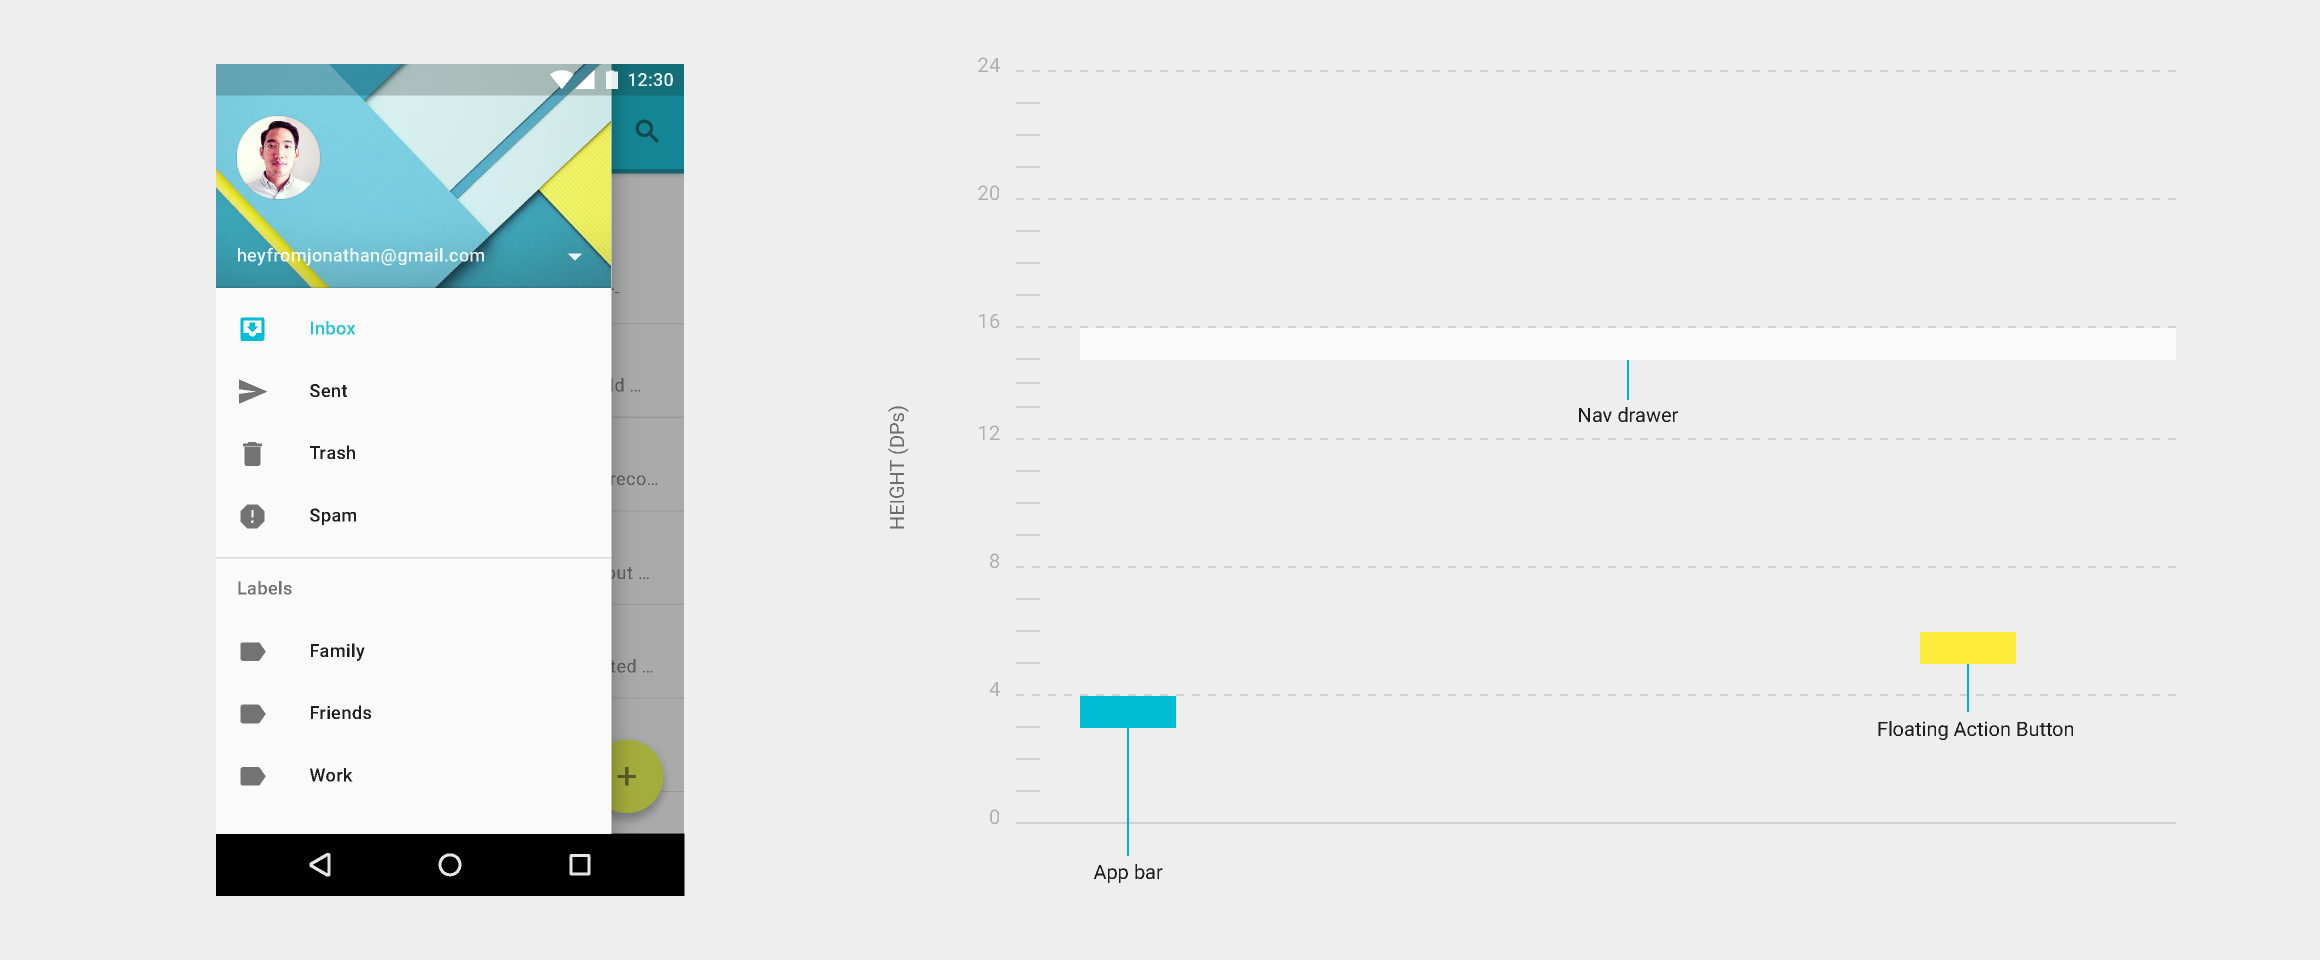 Elevation Shadows Material Design - Elevation measurement app